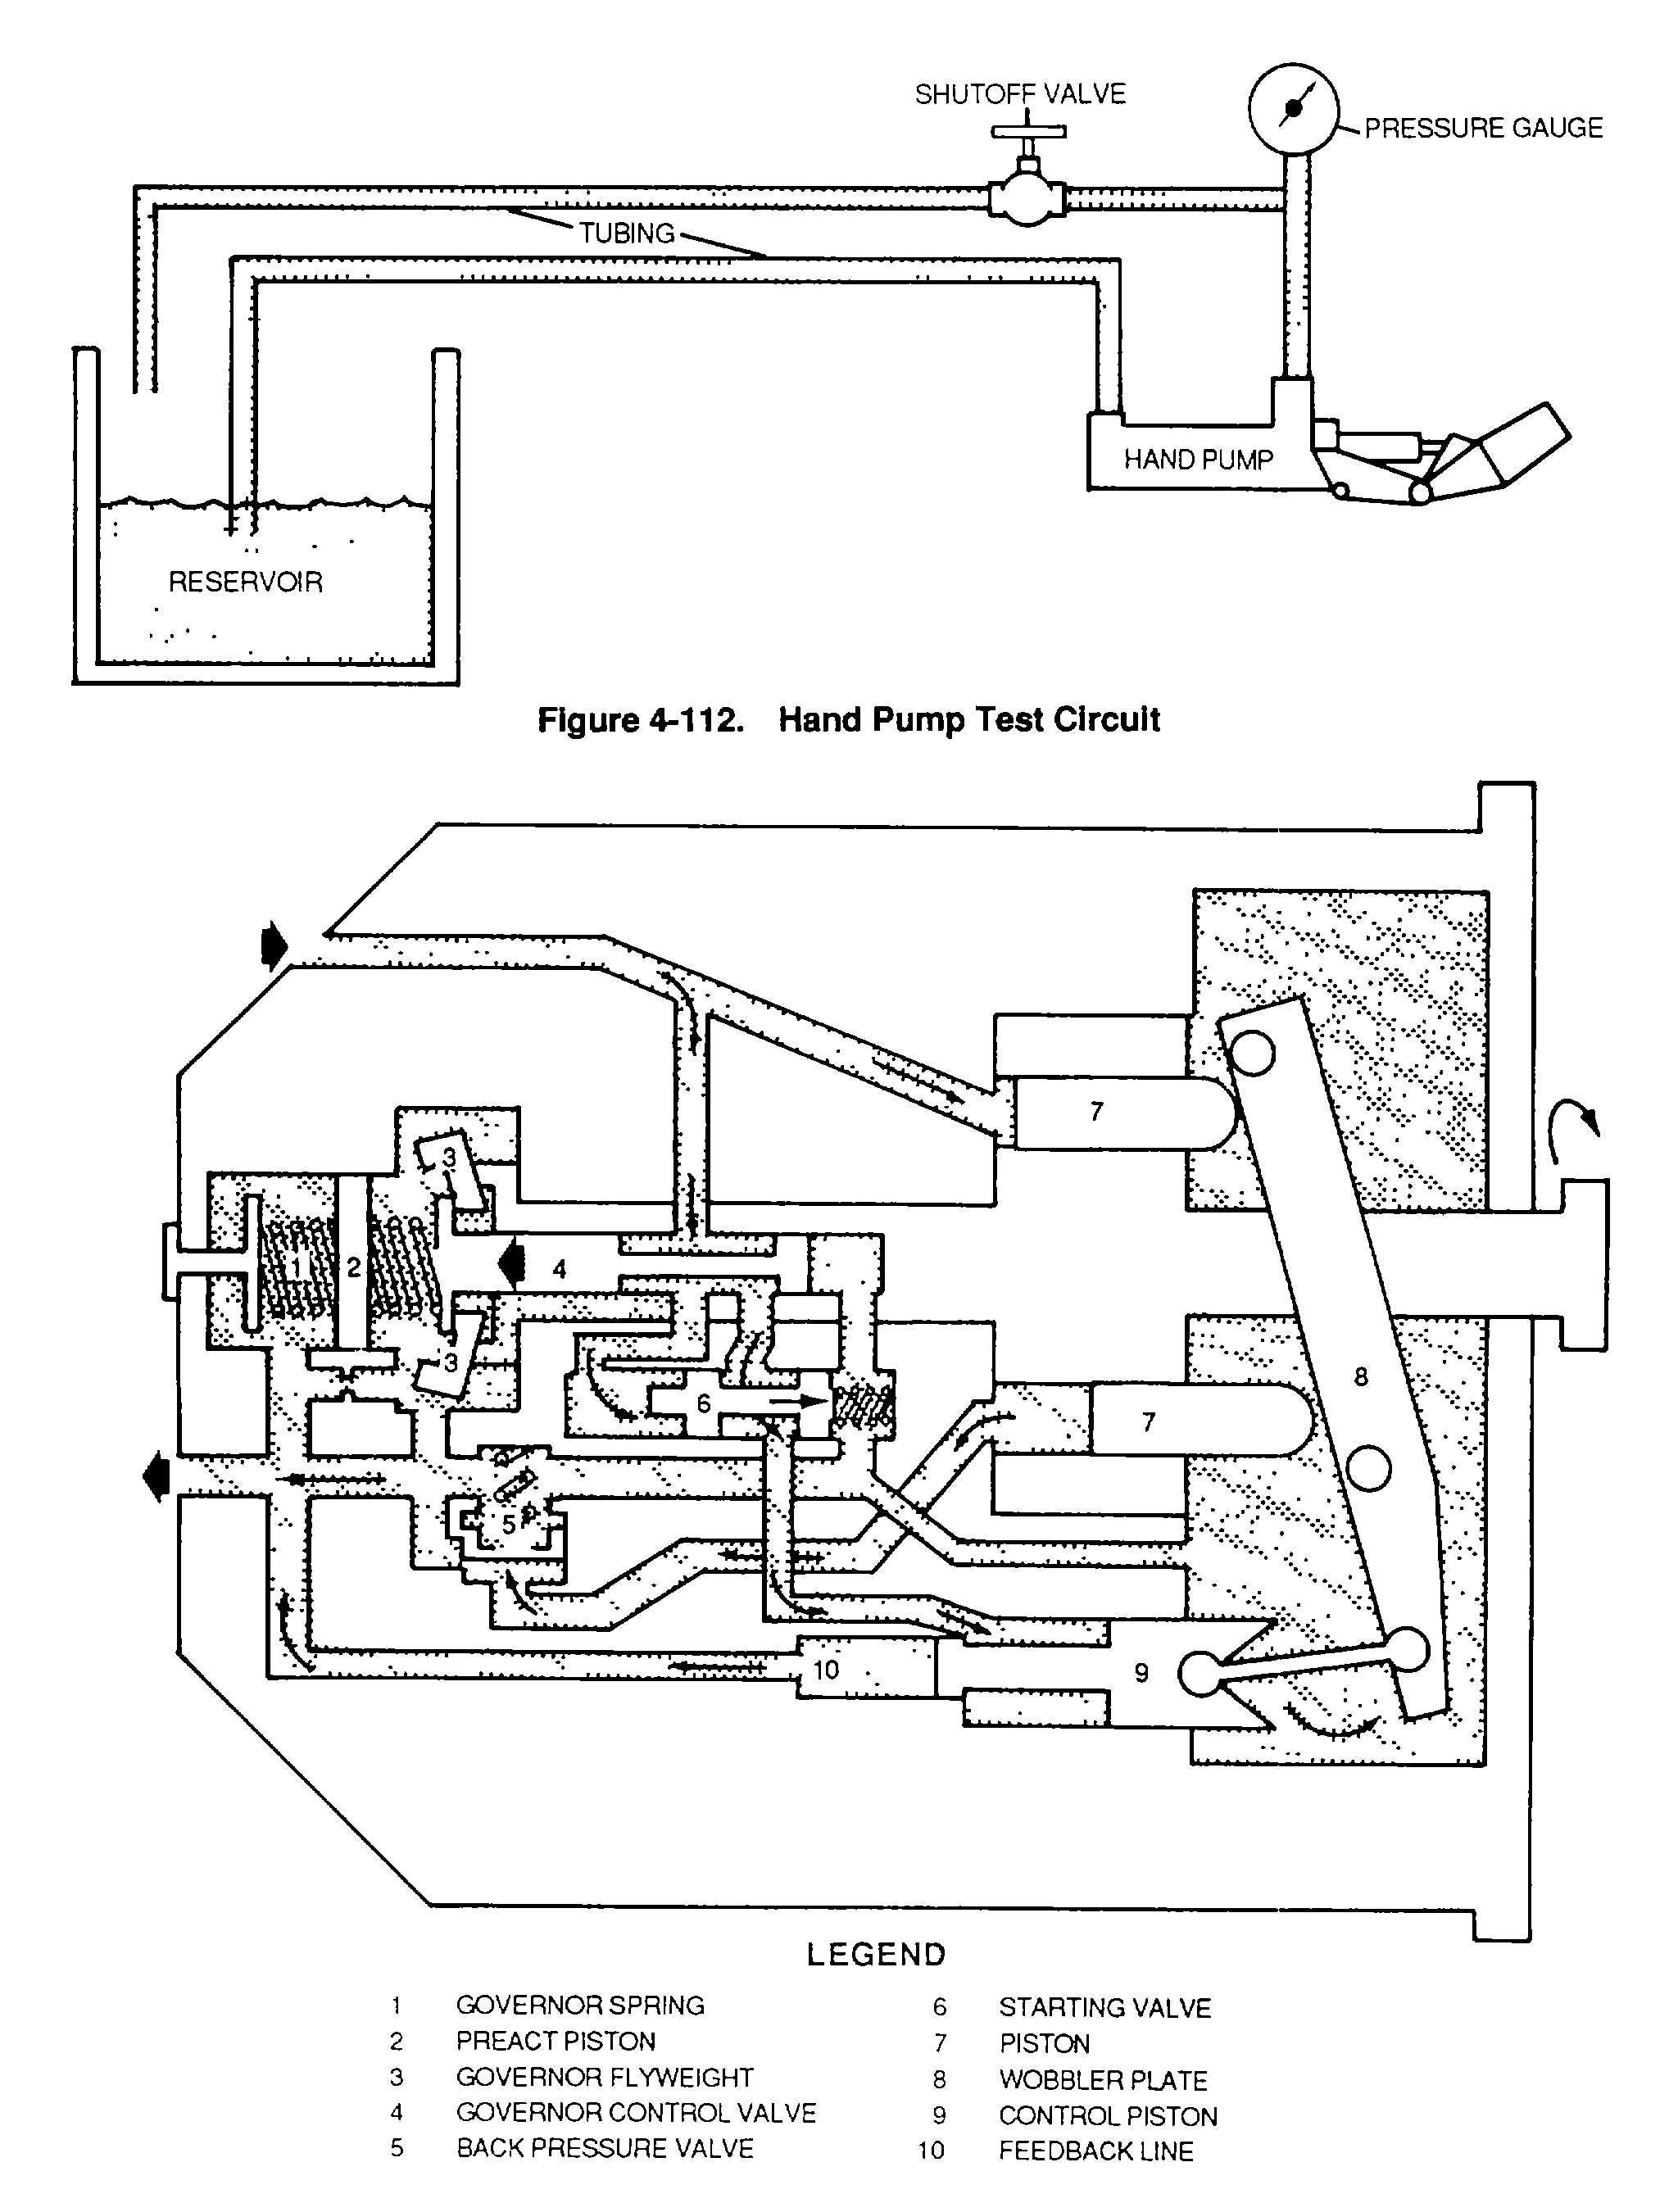 Figure 4-112. Hand Pump Test Circuit